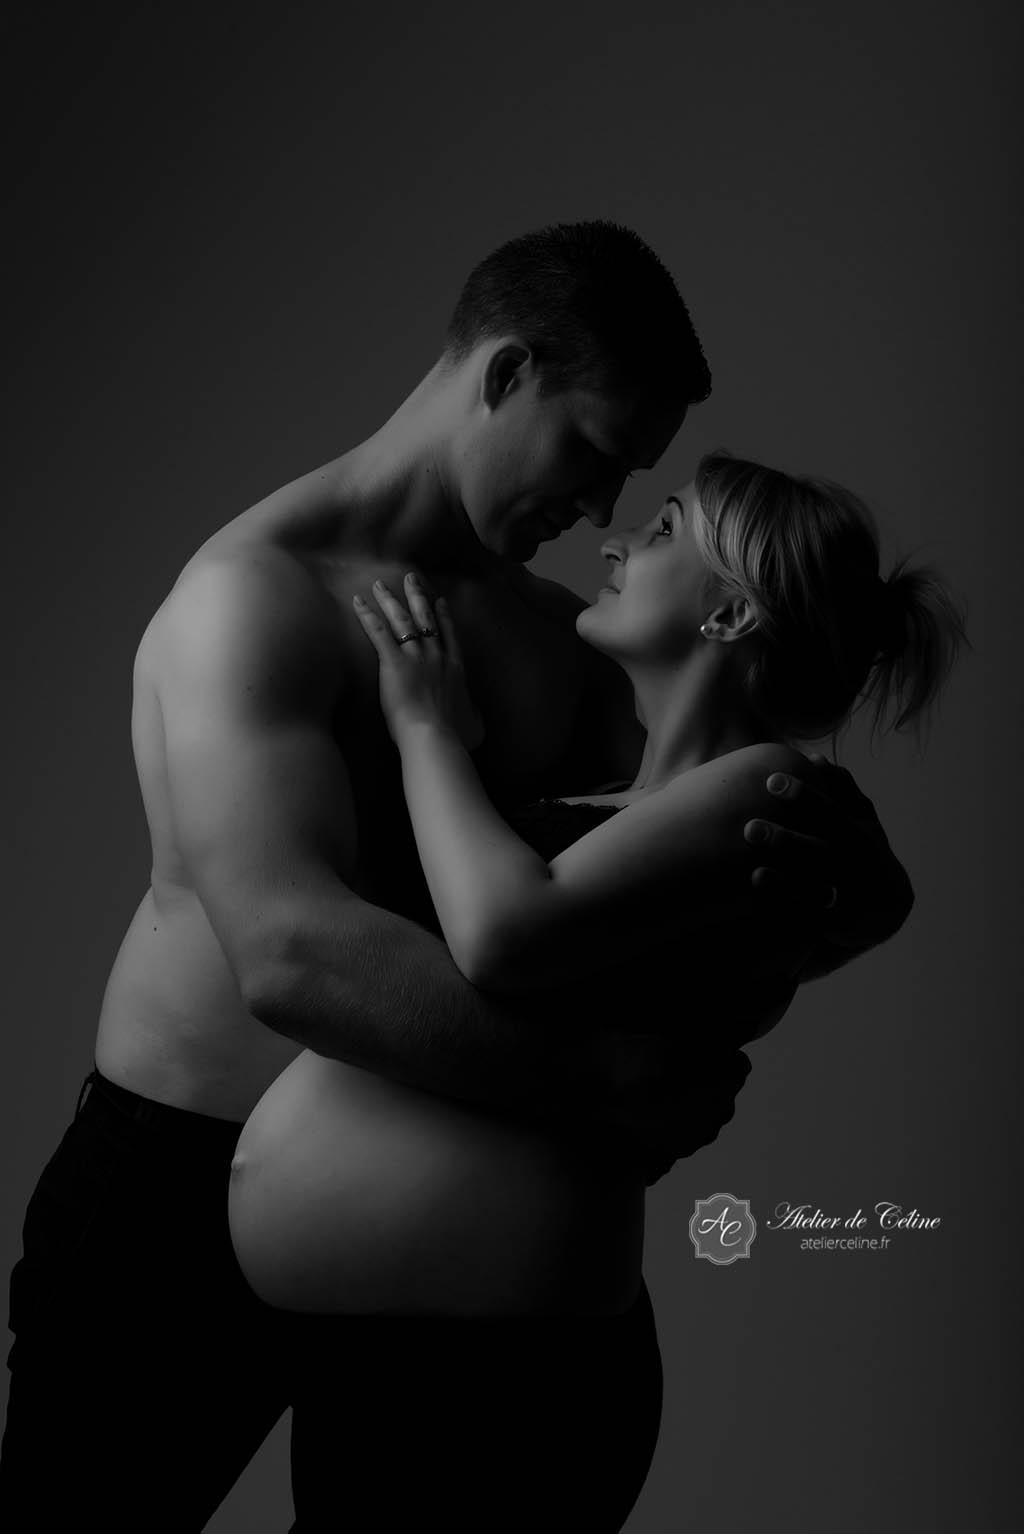 Séance grossesse, femme, femme enceinte, studio, couple (2)